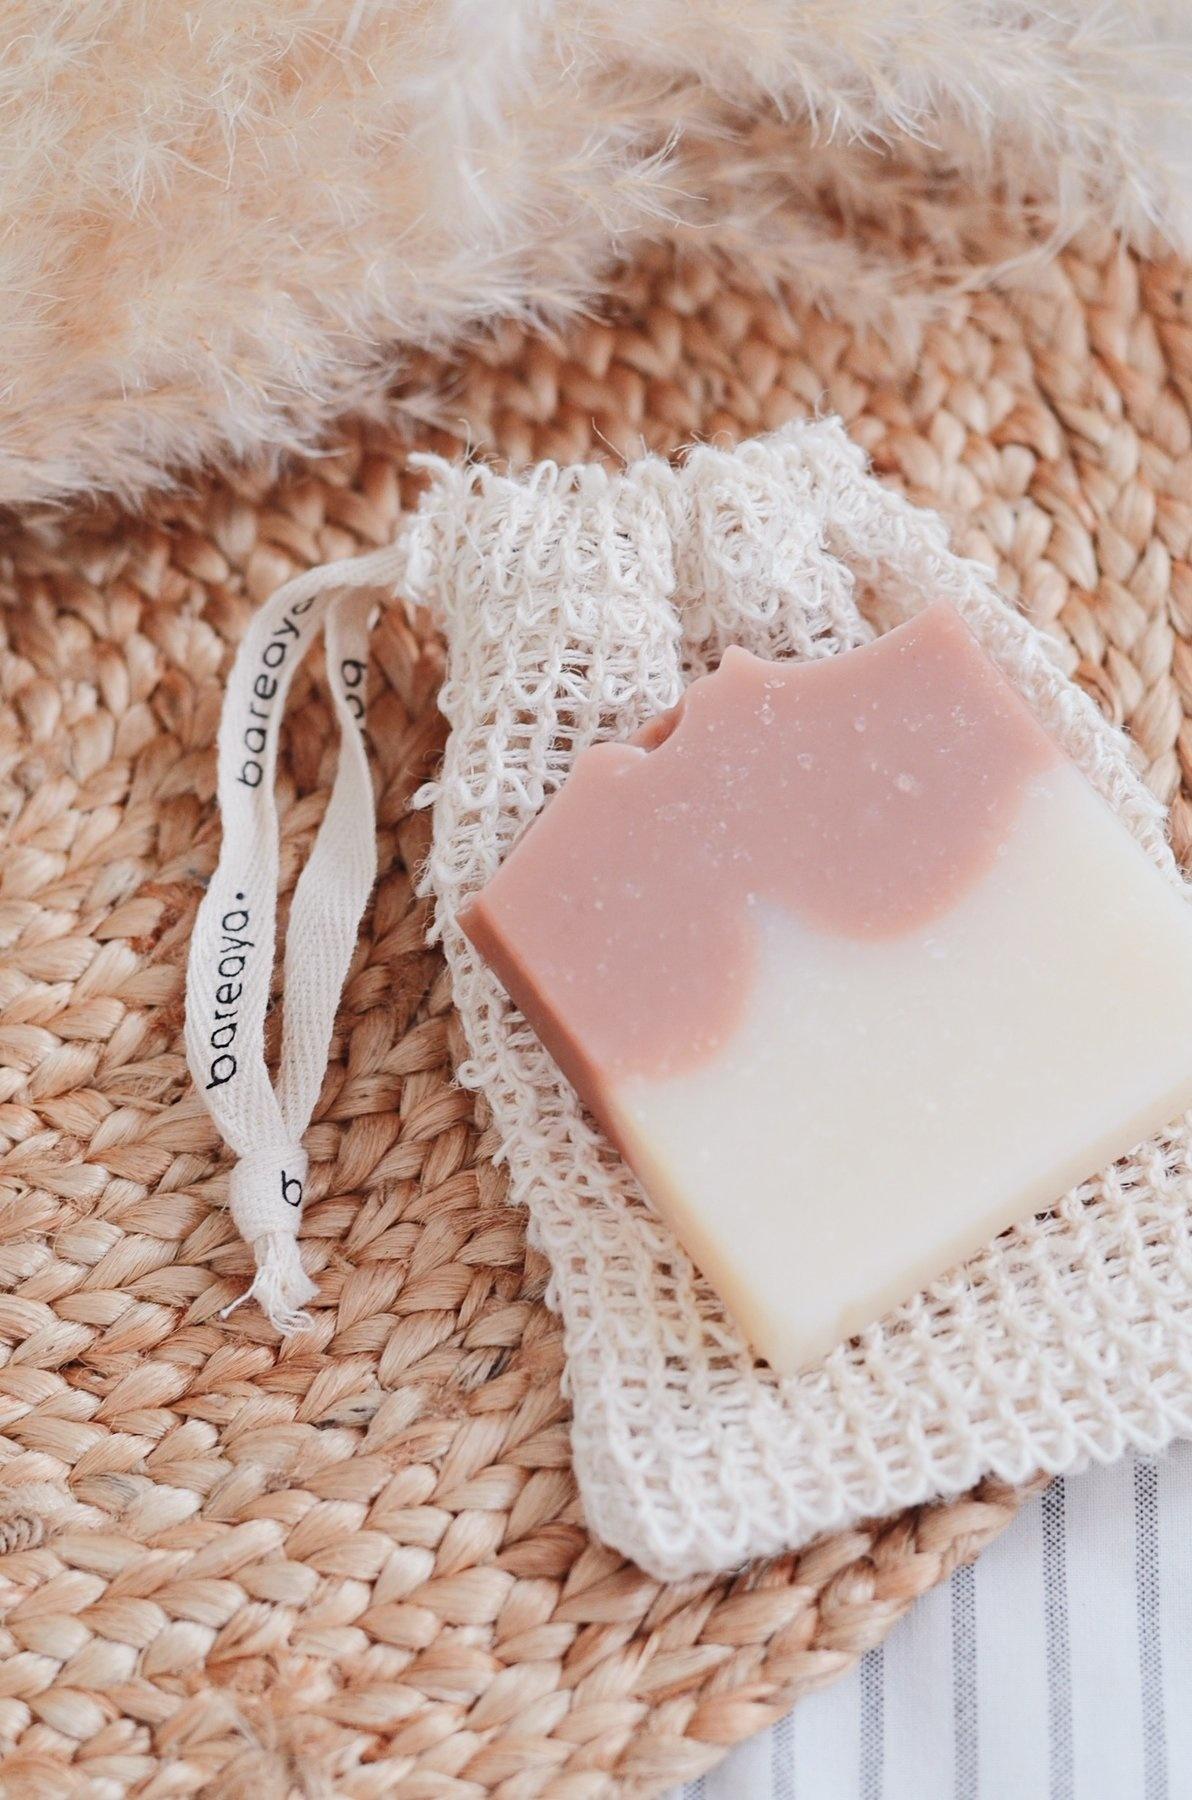 Shaving Bar - Rosemary & Pink Clay-3